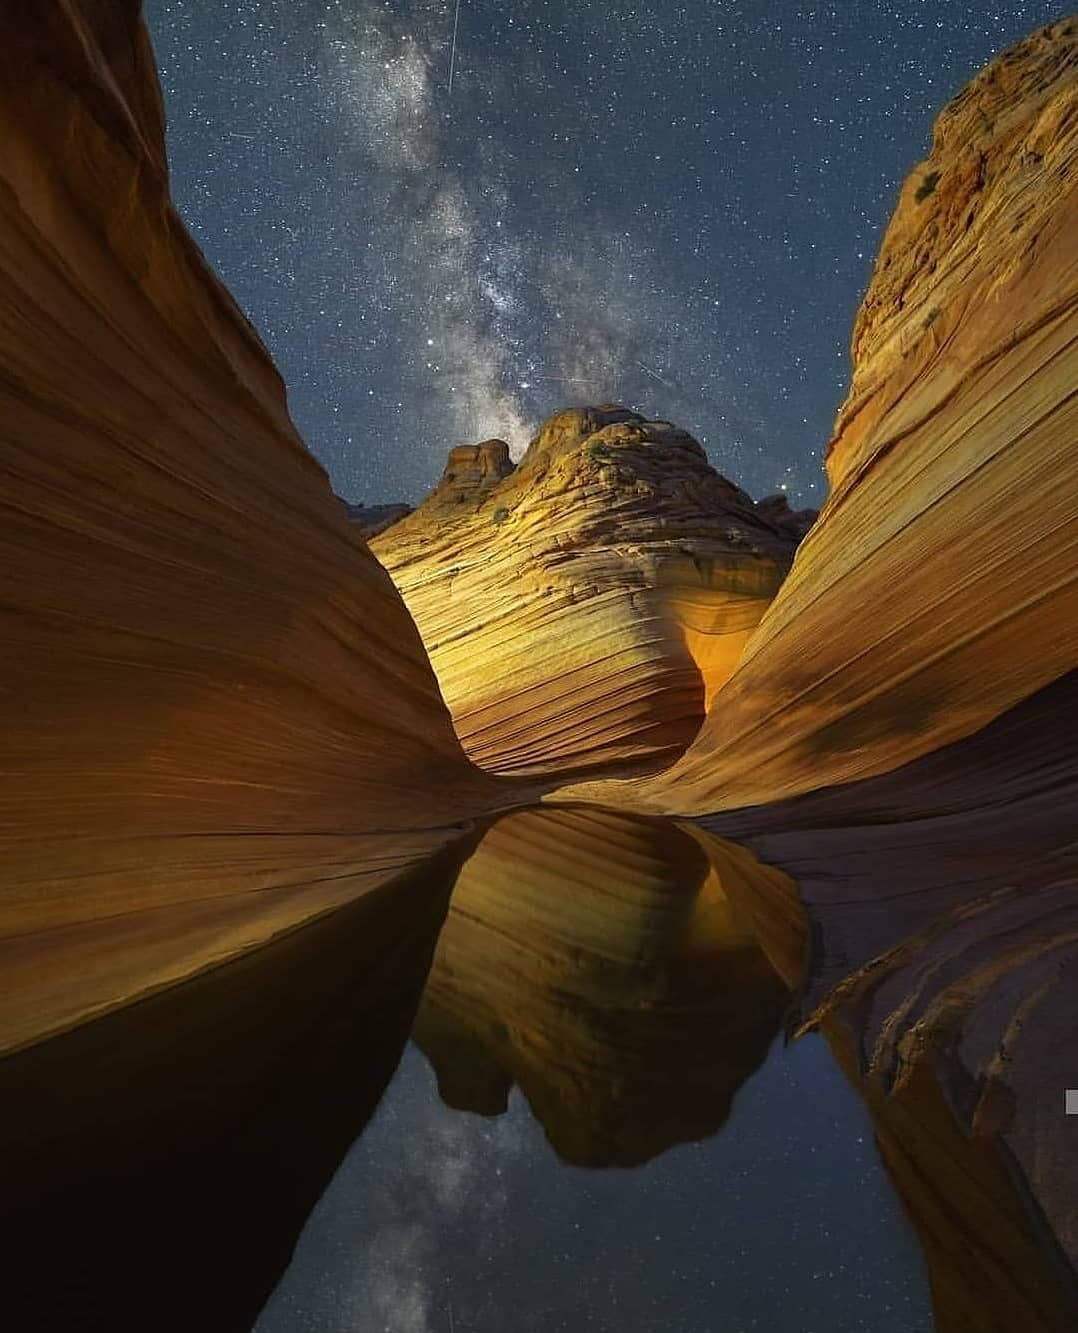 Природа и путешествия на снимках Дастина Лефевра